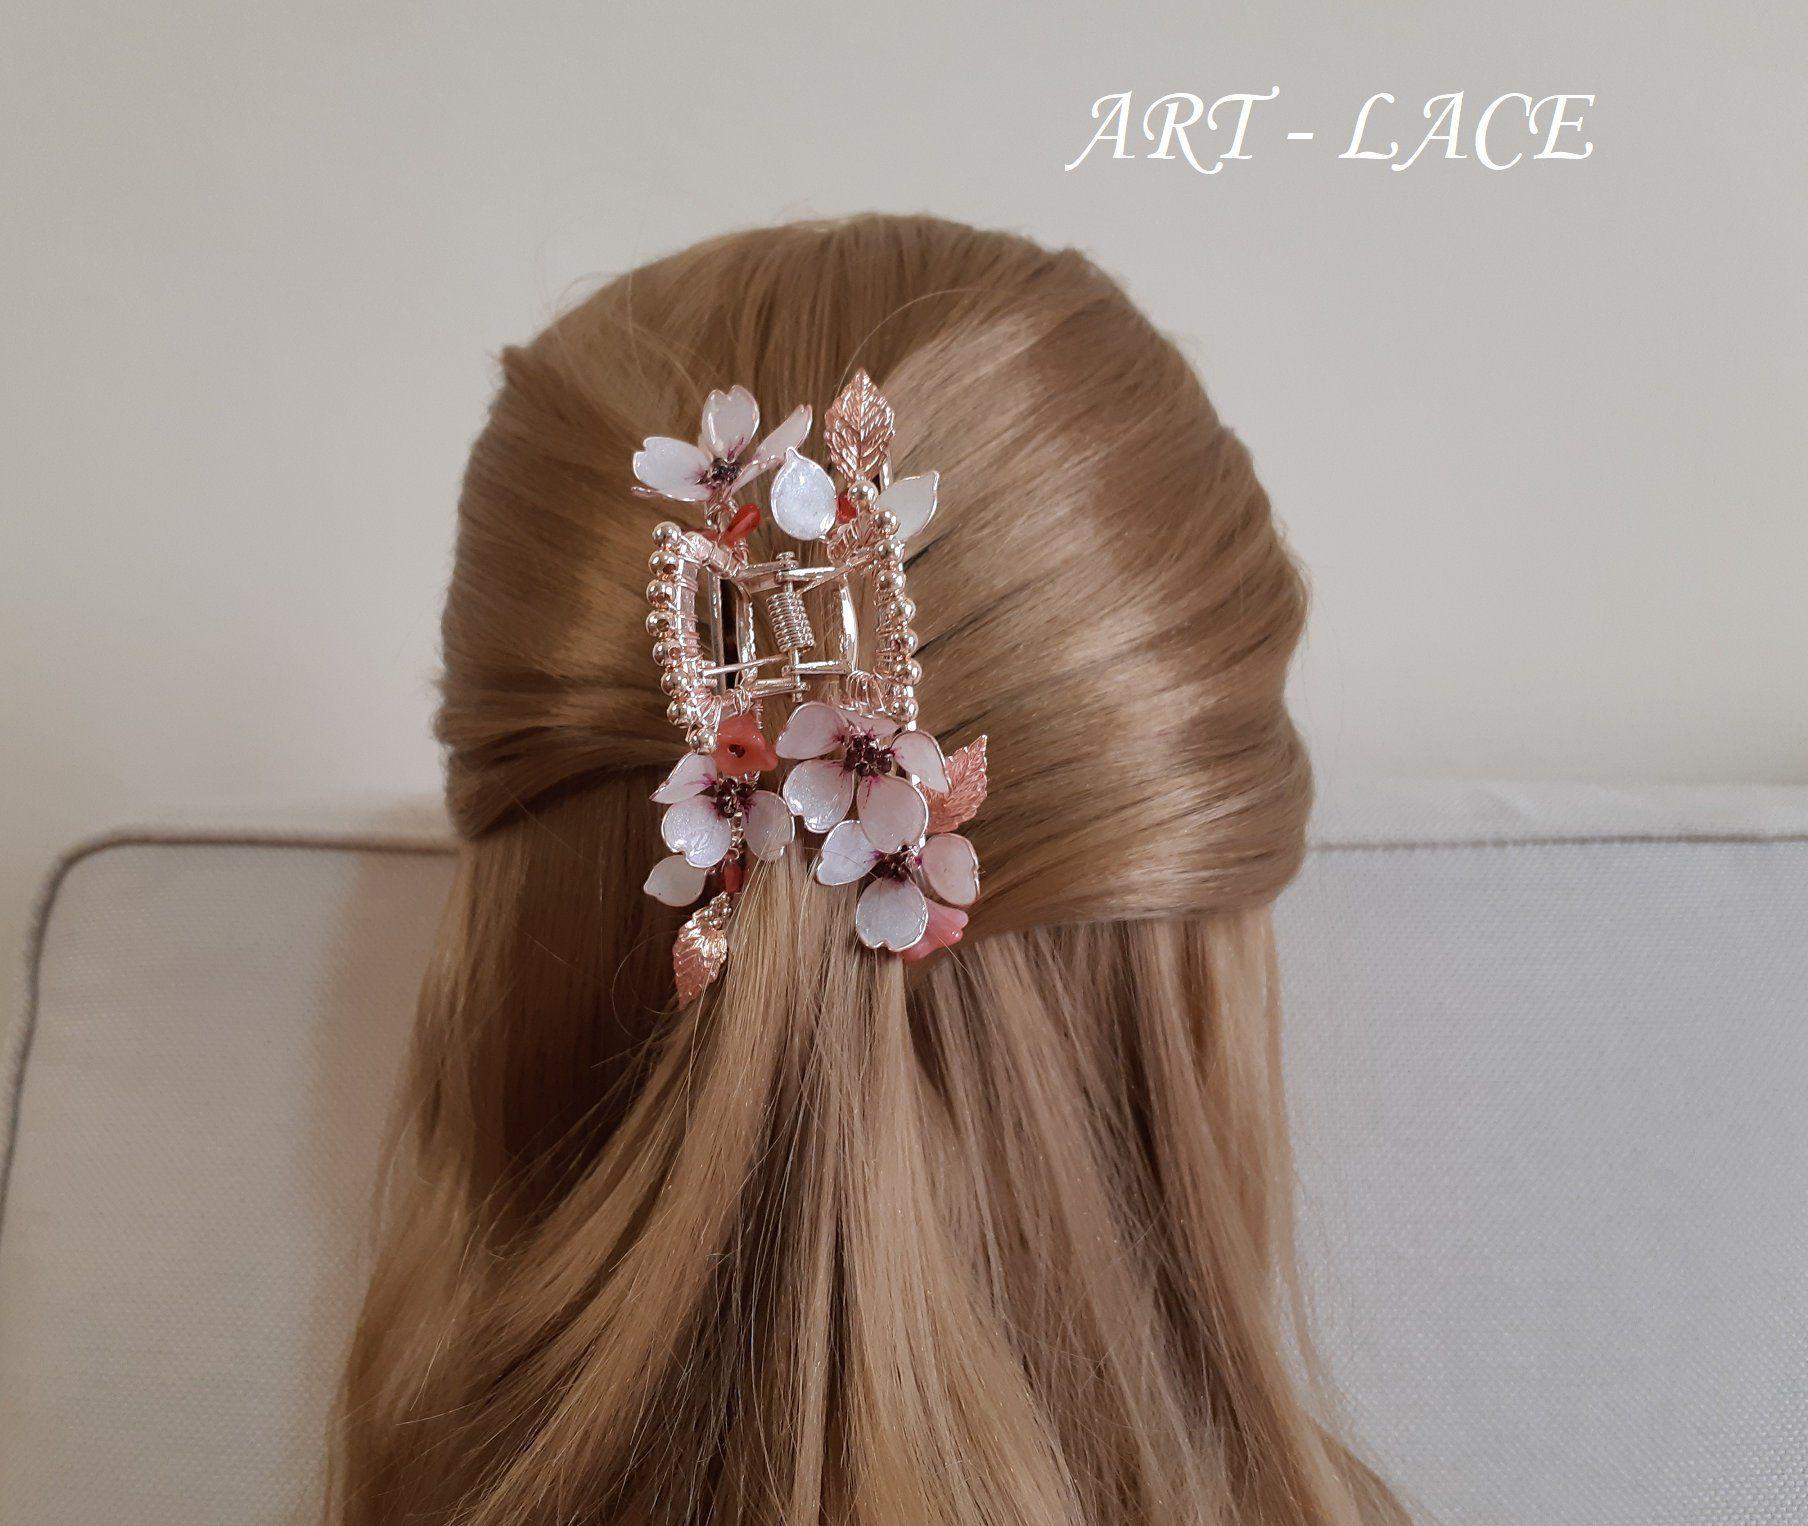 Bridal Cherry Blossom Hair Claw Clips Rose Gold Jaw Clips Etsy Pink Hair Clips Bridal Hair Clip Hair Claw